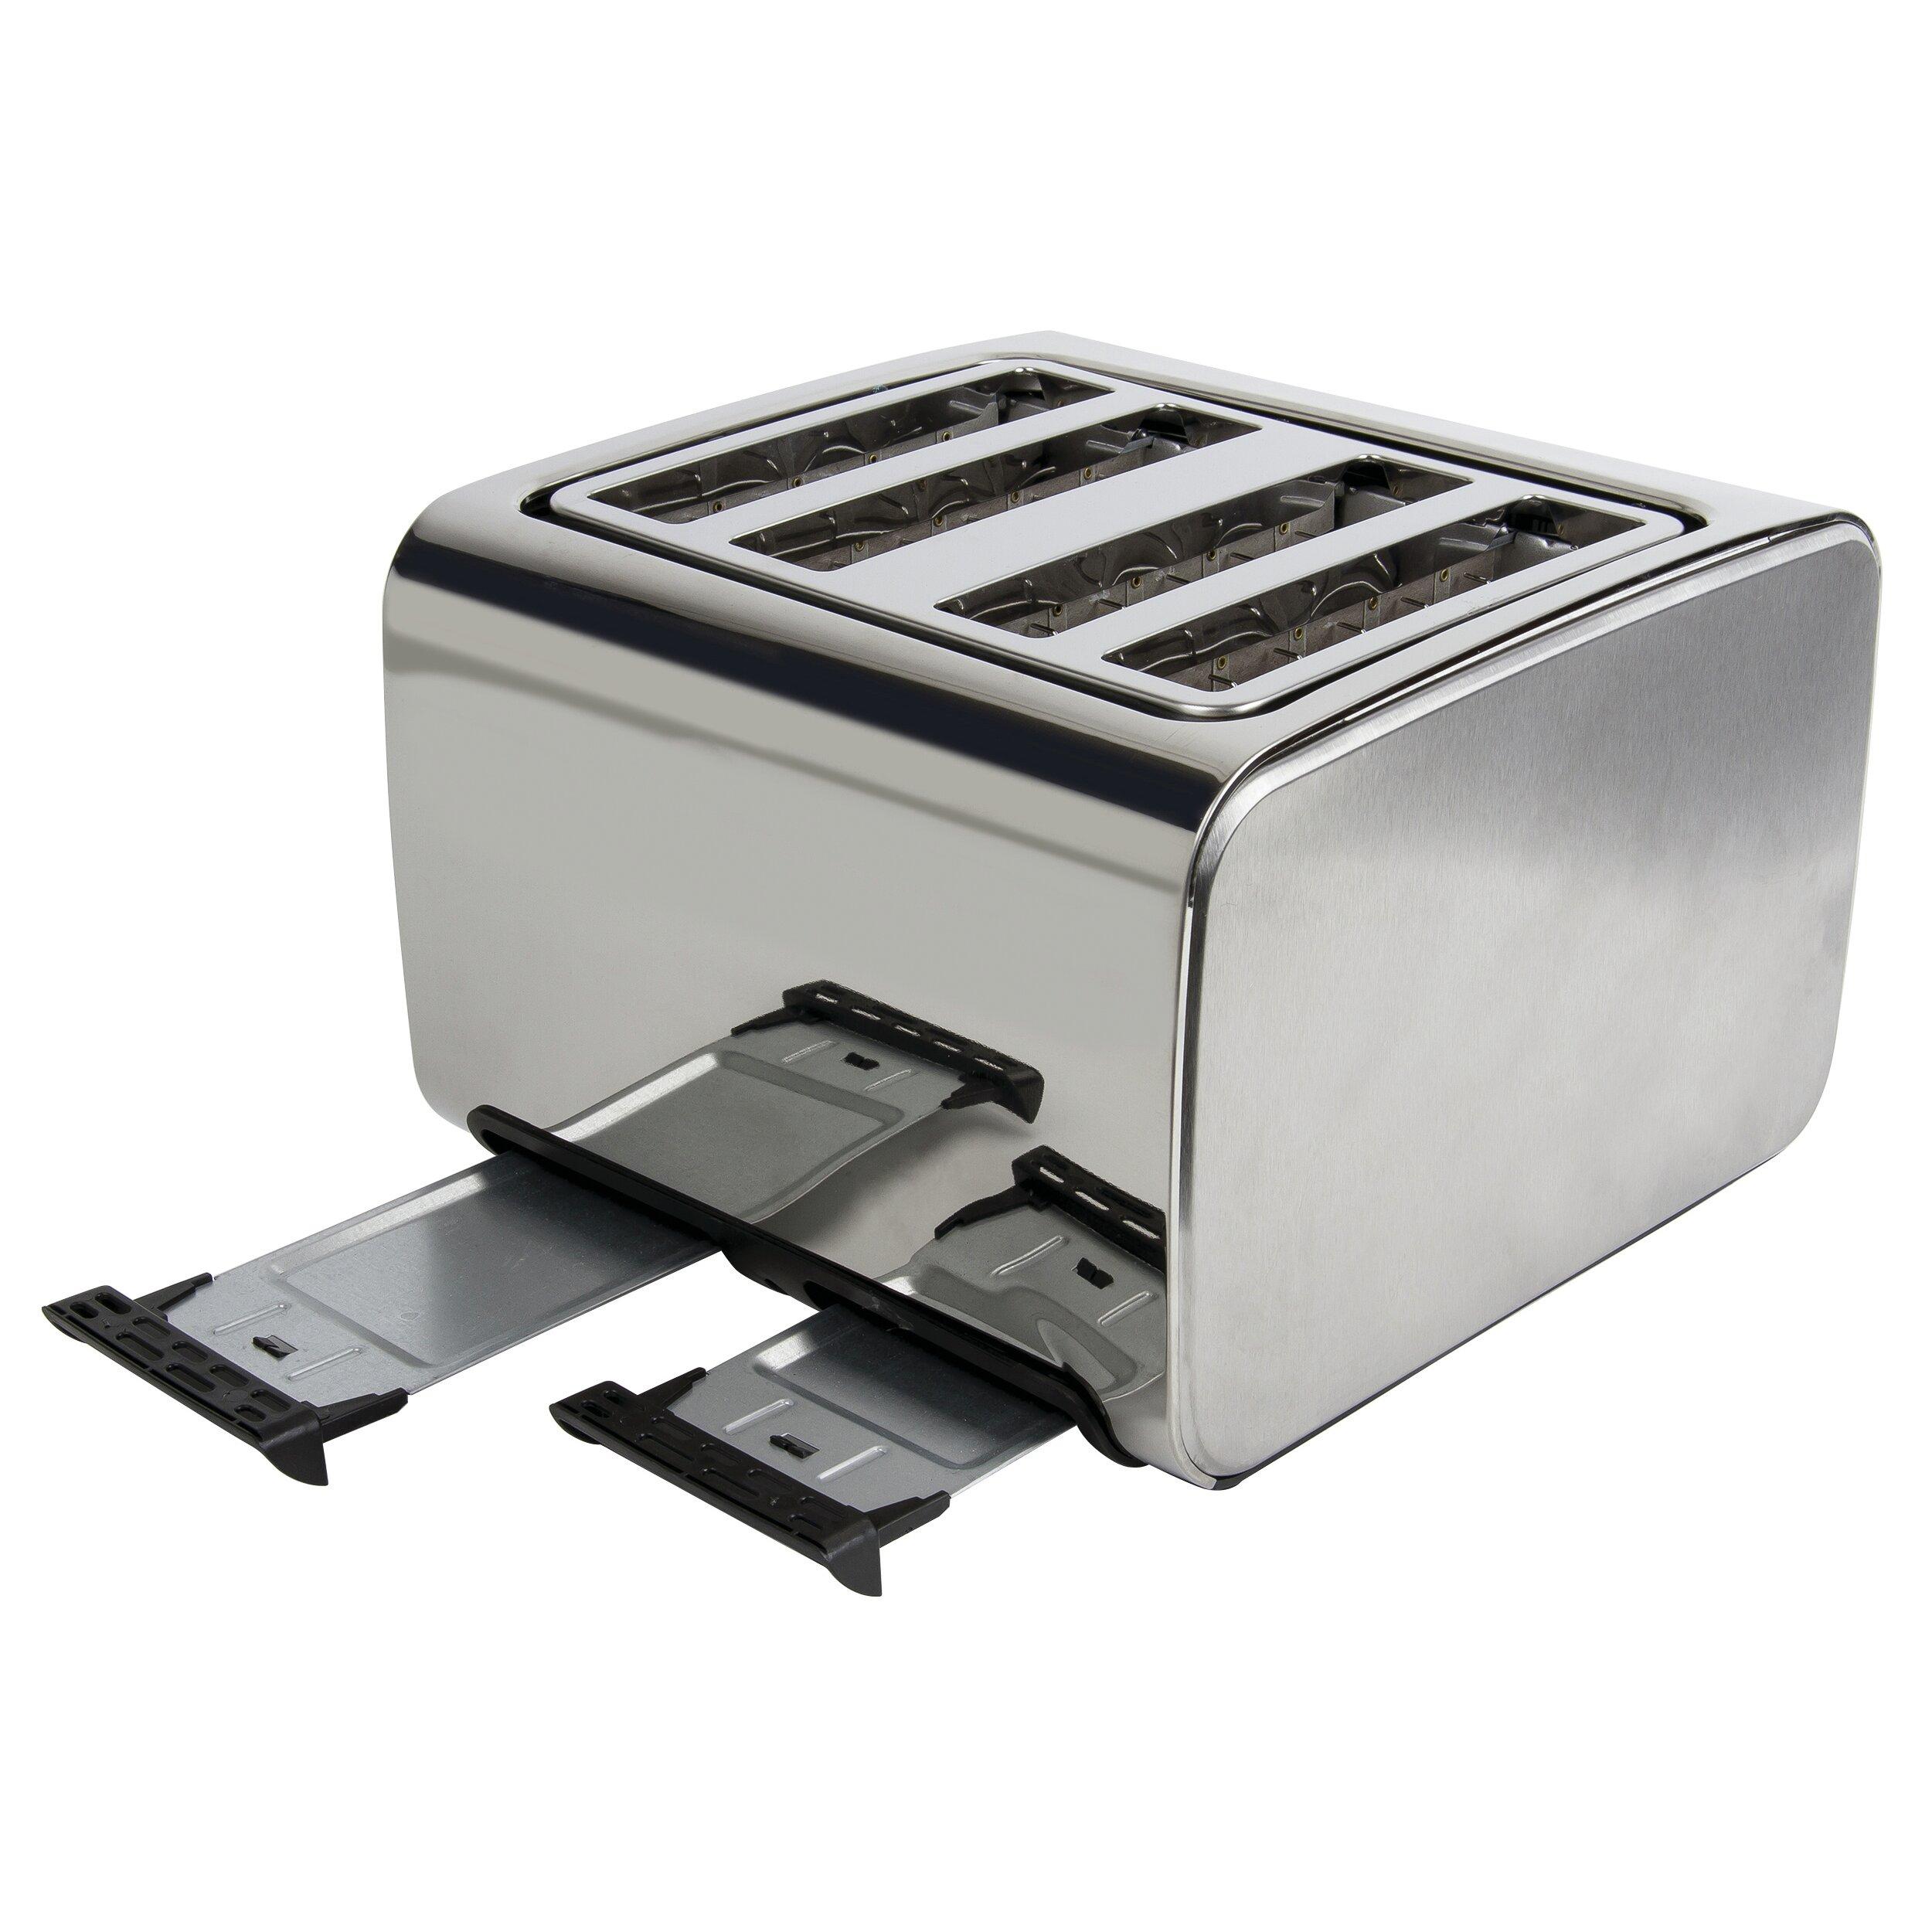 Glass Toaster 4 Slice ~ Igenix slice toaster wayfair uk